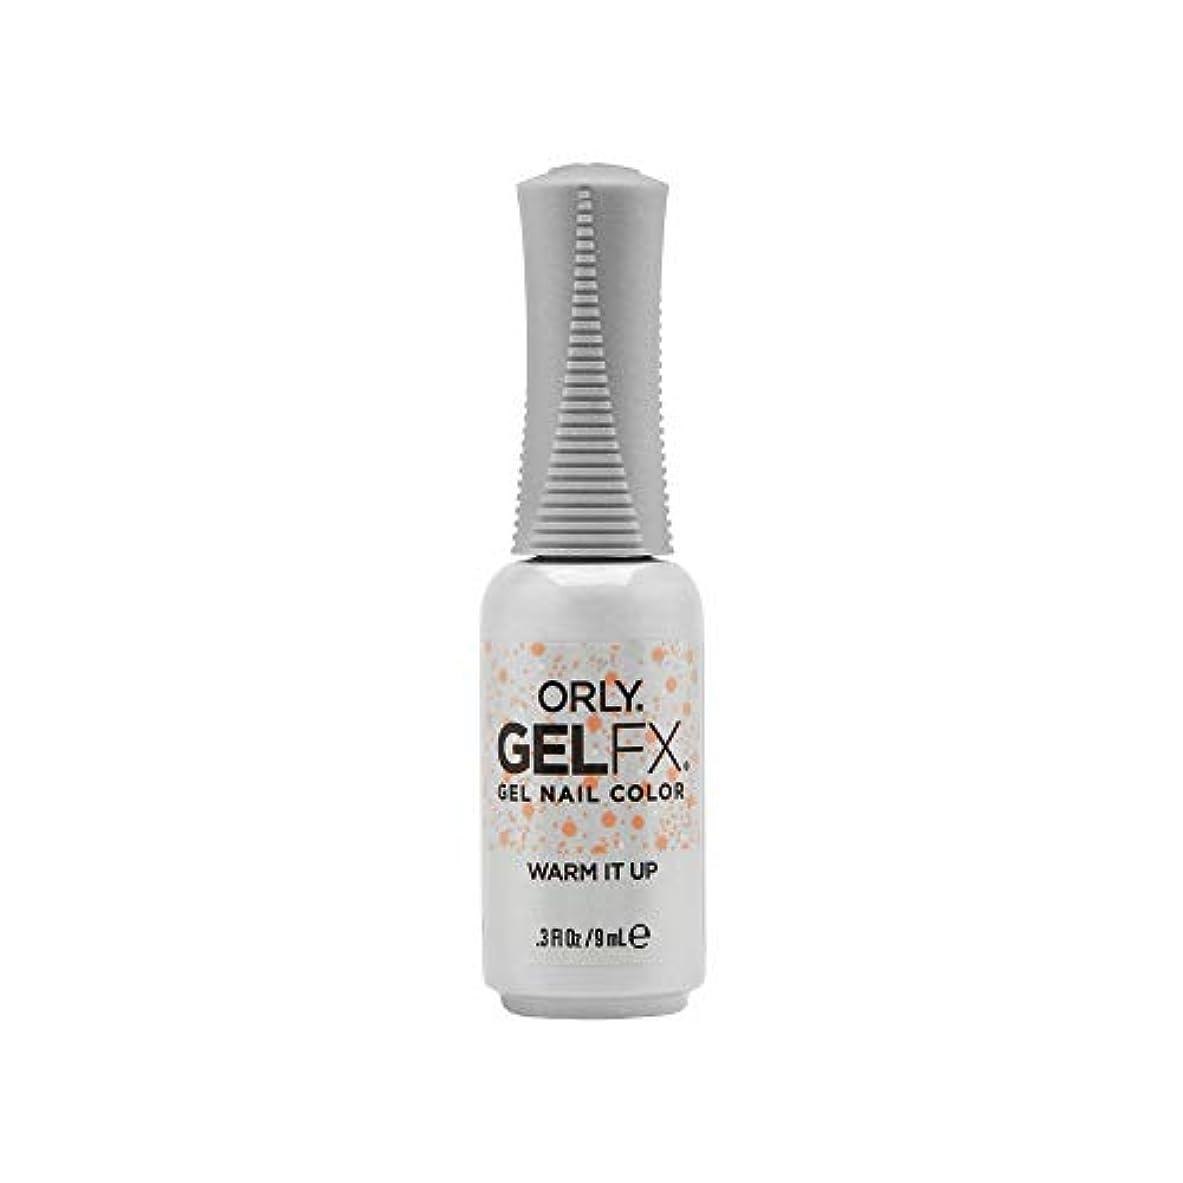 中古強制的建設ORLY Gel FX - Euphoria 2019 Collection - Warm It Up - 0.3 oz / 9 mL